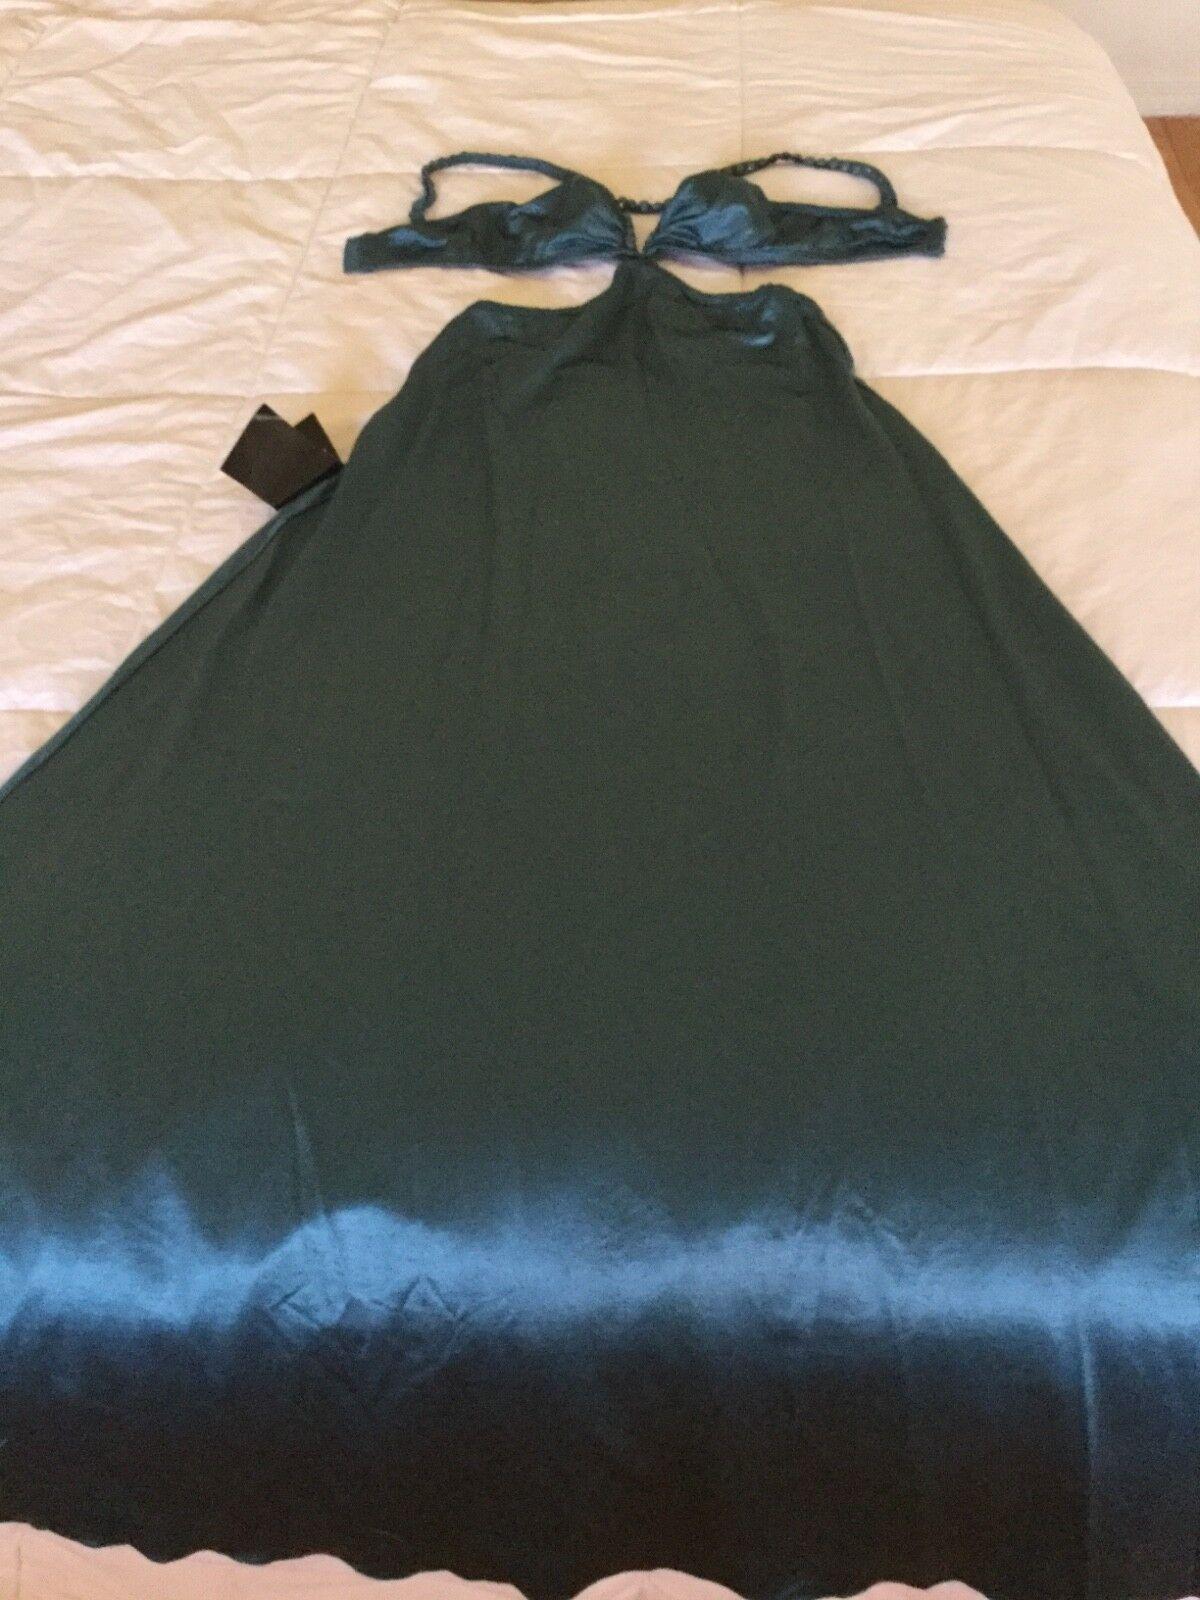 BEBE teal bluee green maxi dress cut off SEXY xs NEW